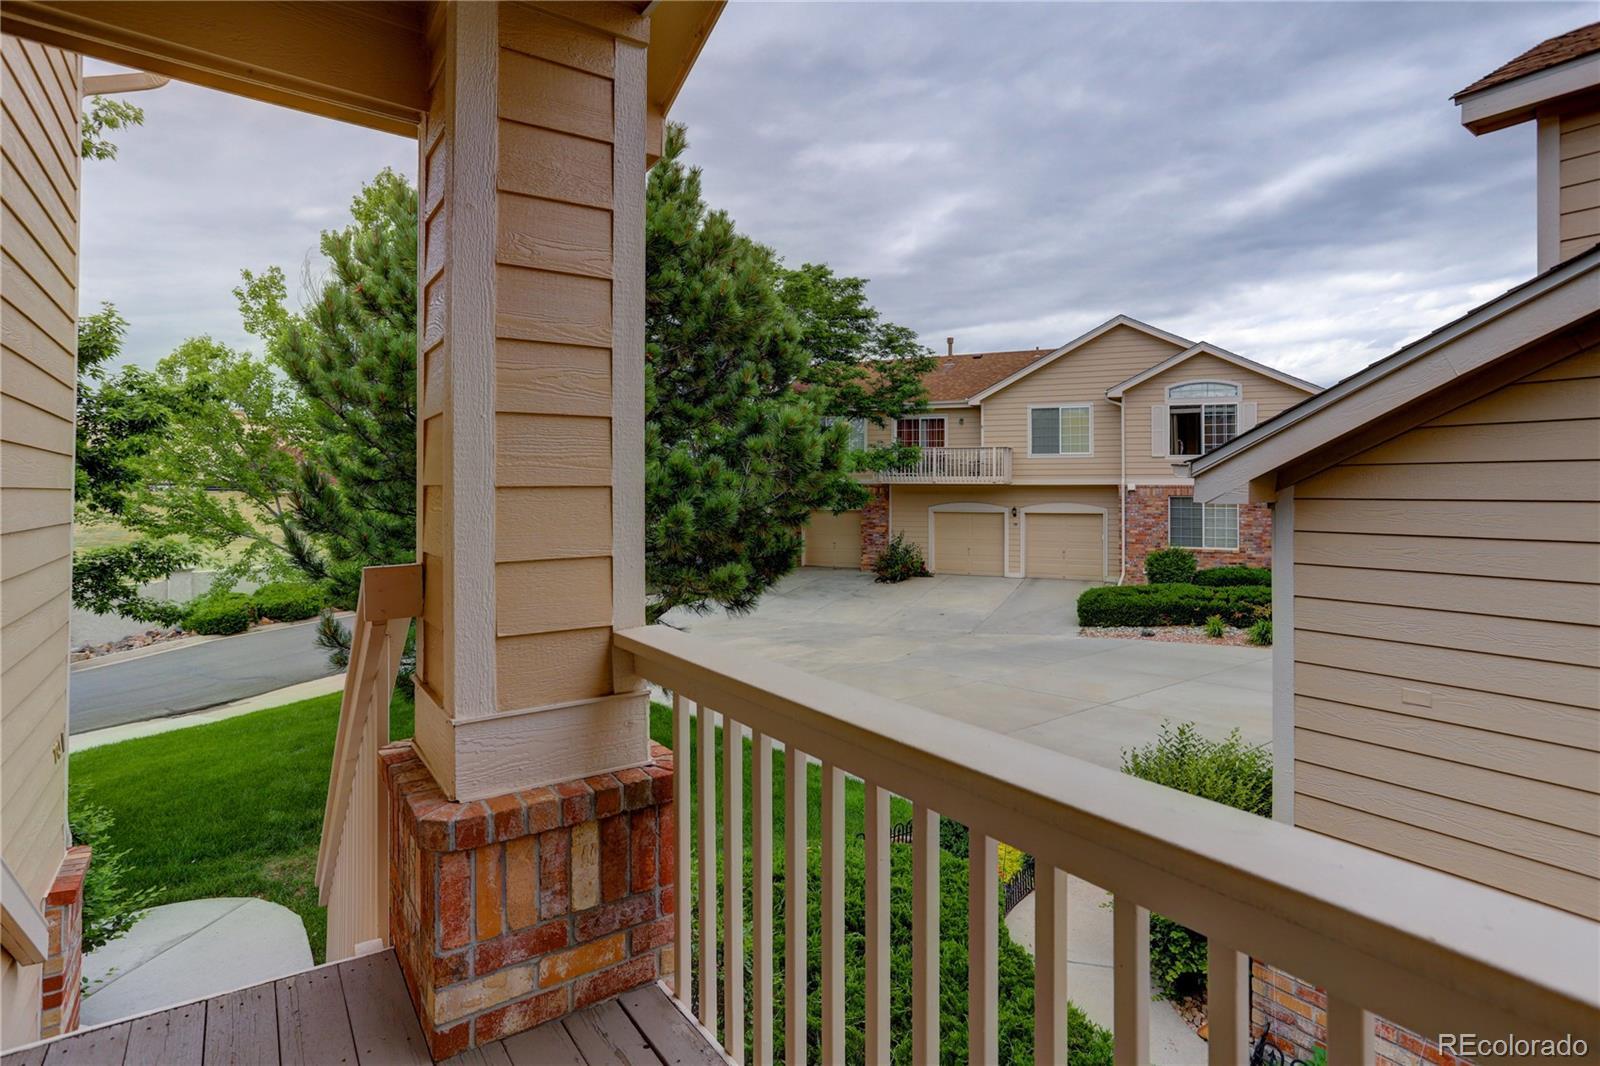 MLS# 2836182 - 4 - 7700 W Grant Ranch Boulevard #10D, Littleton, CO 80123